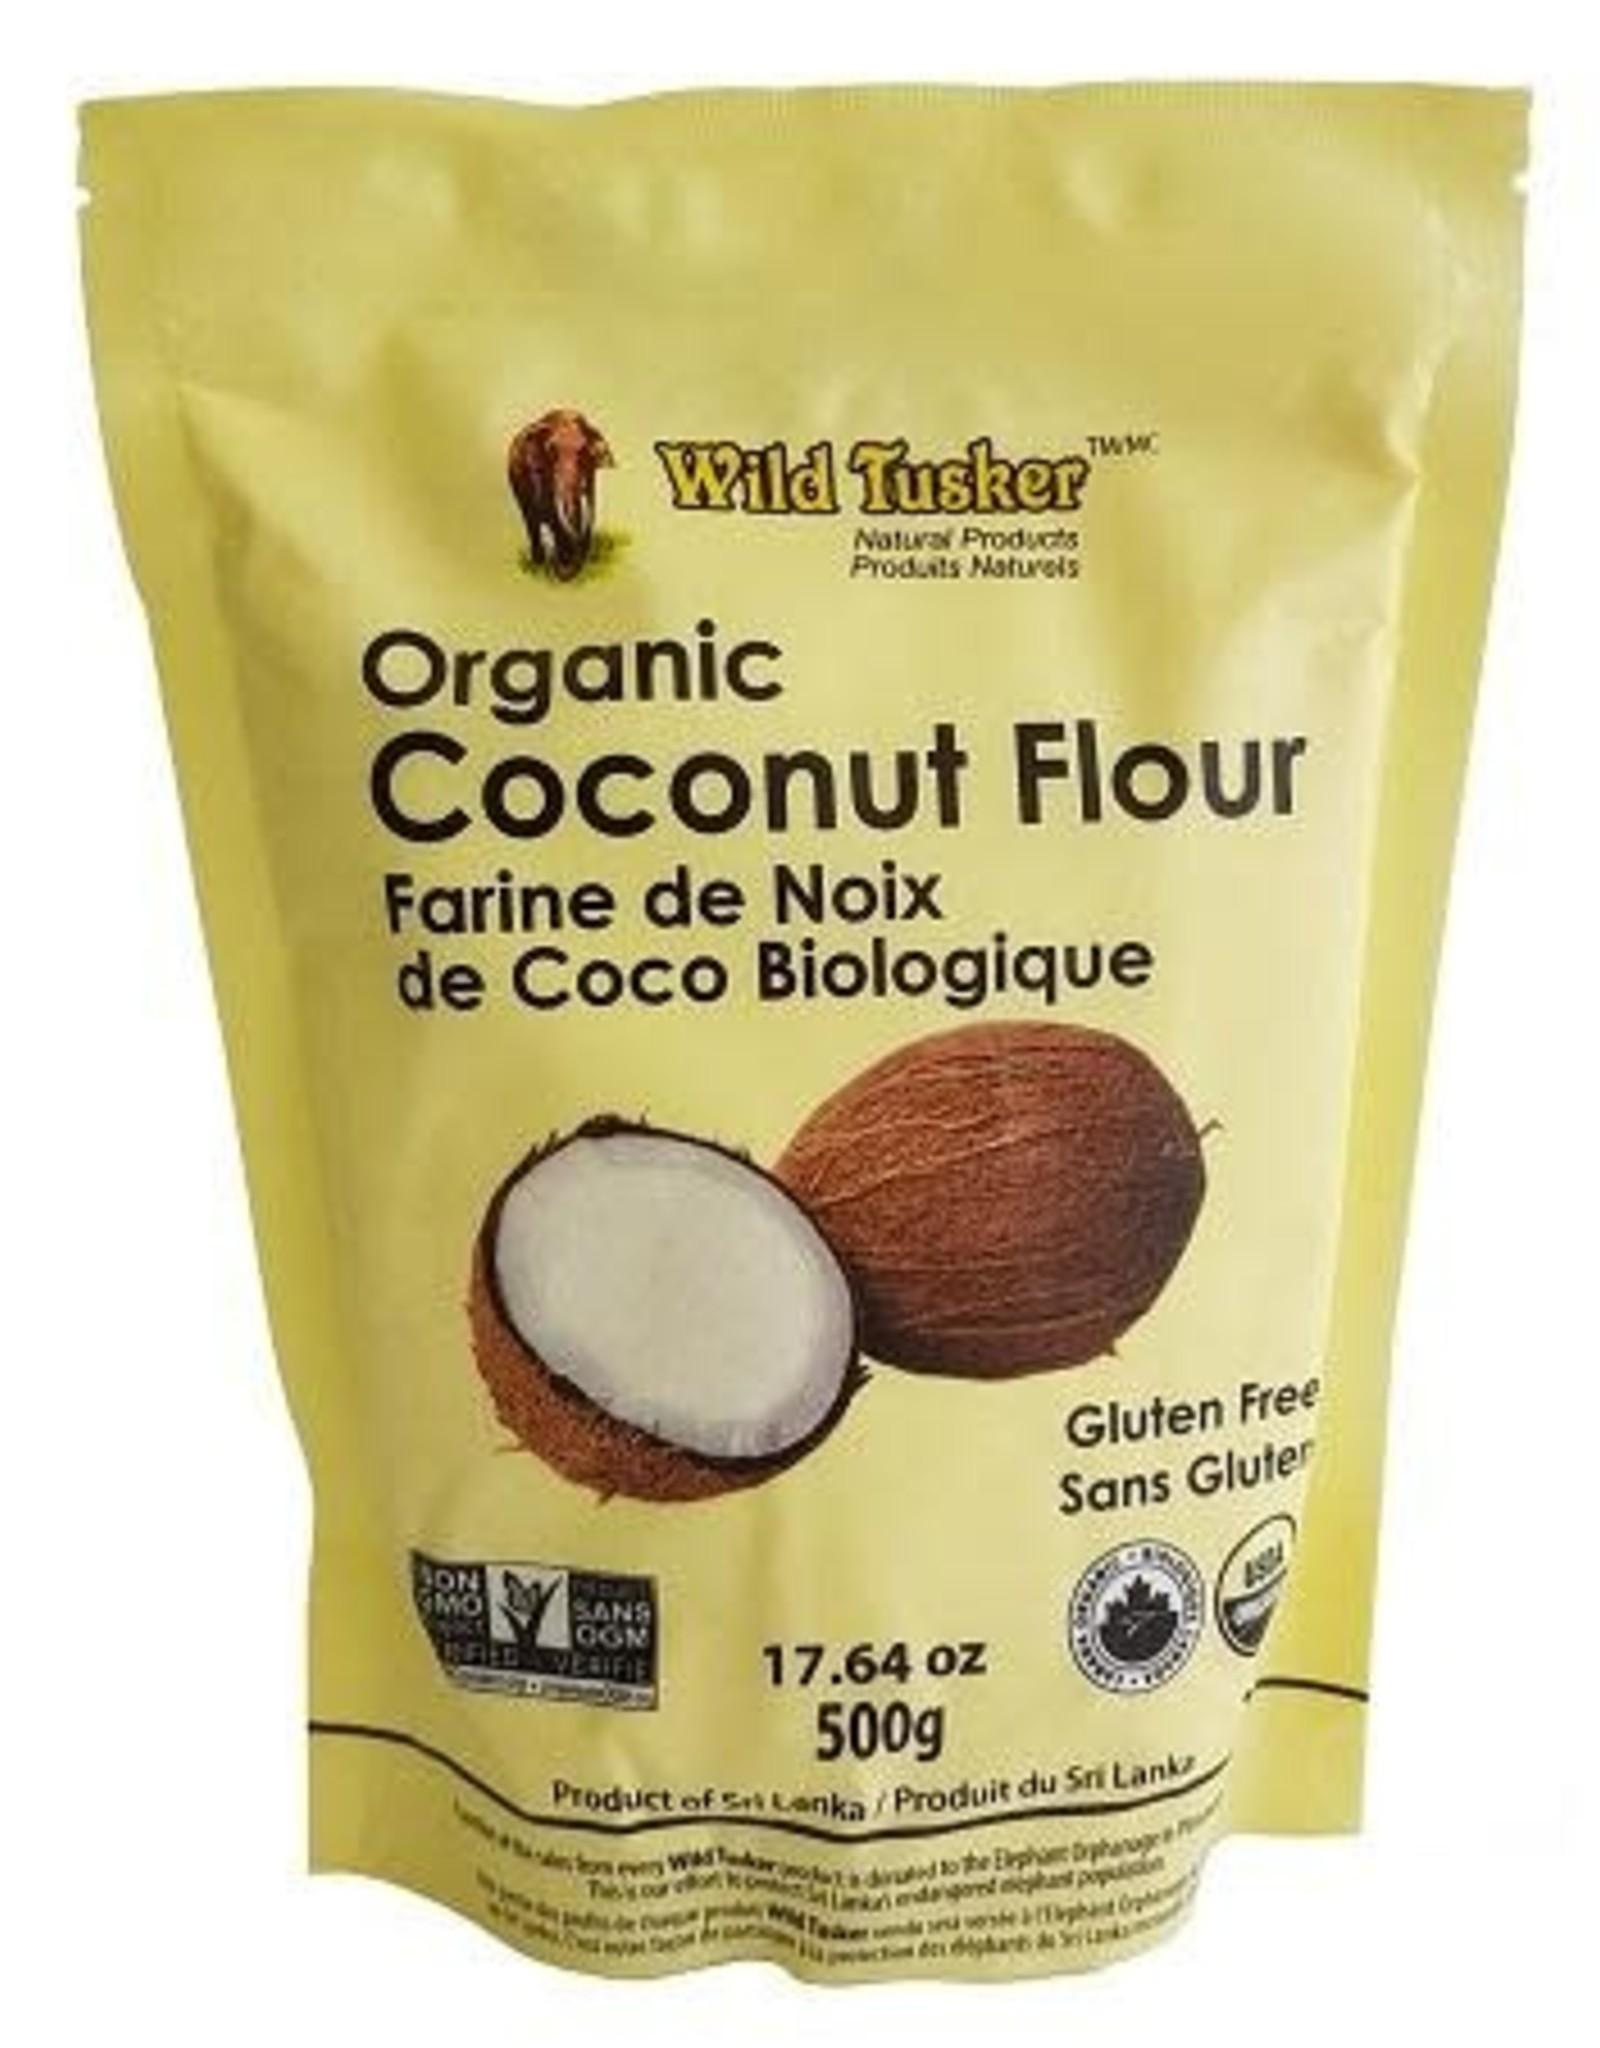 Wild Tusker Wild Tusker- Organic Coconut Flour, 500g